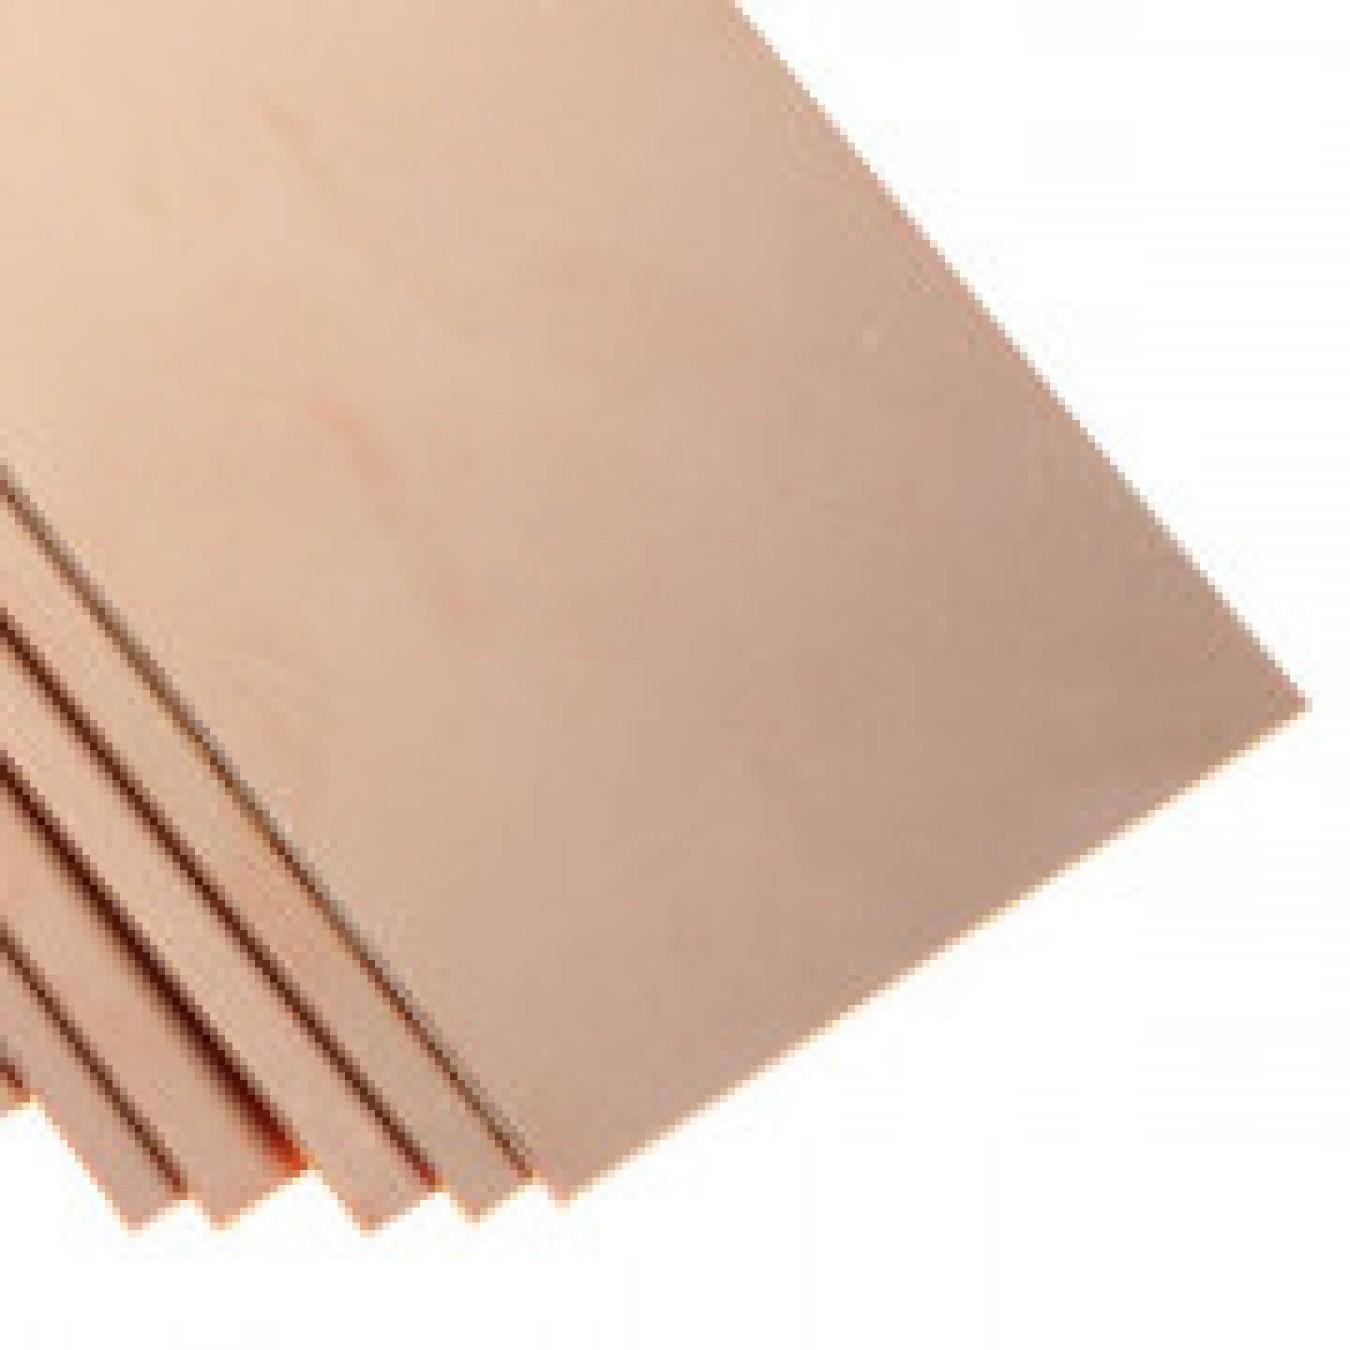 Платка Boards Copper Clad Epoxy Glass one-side 1.6 mm 100х200 mm